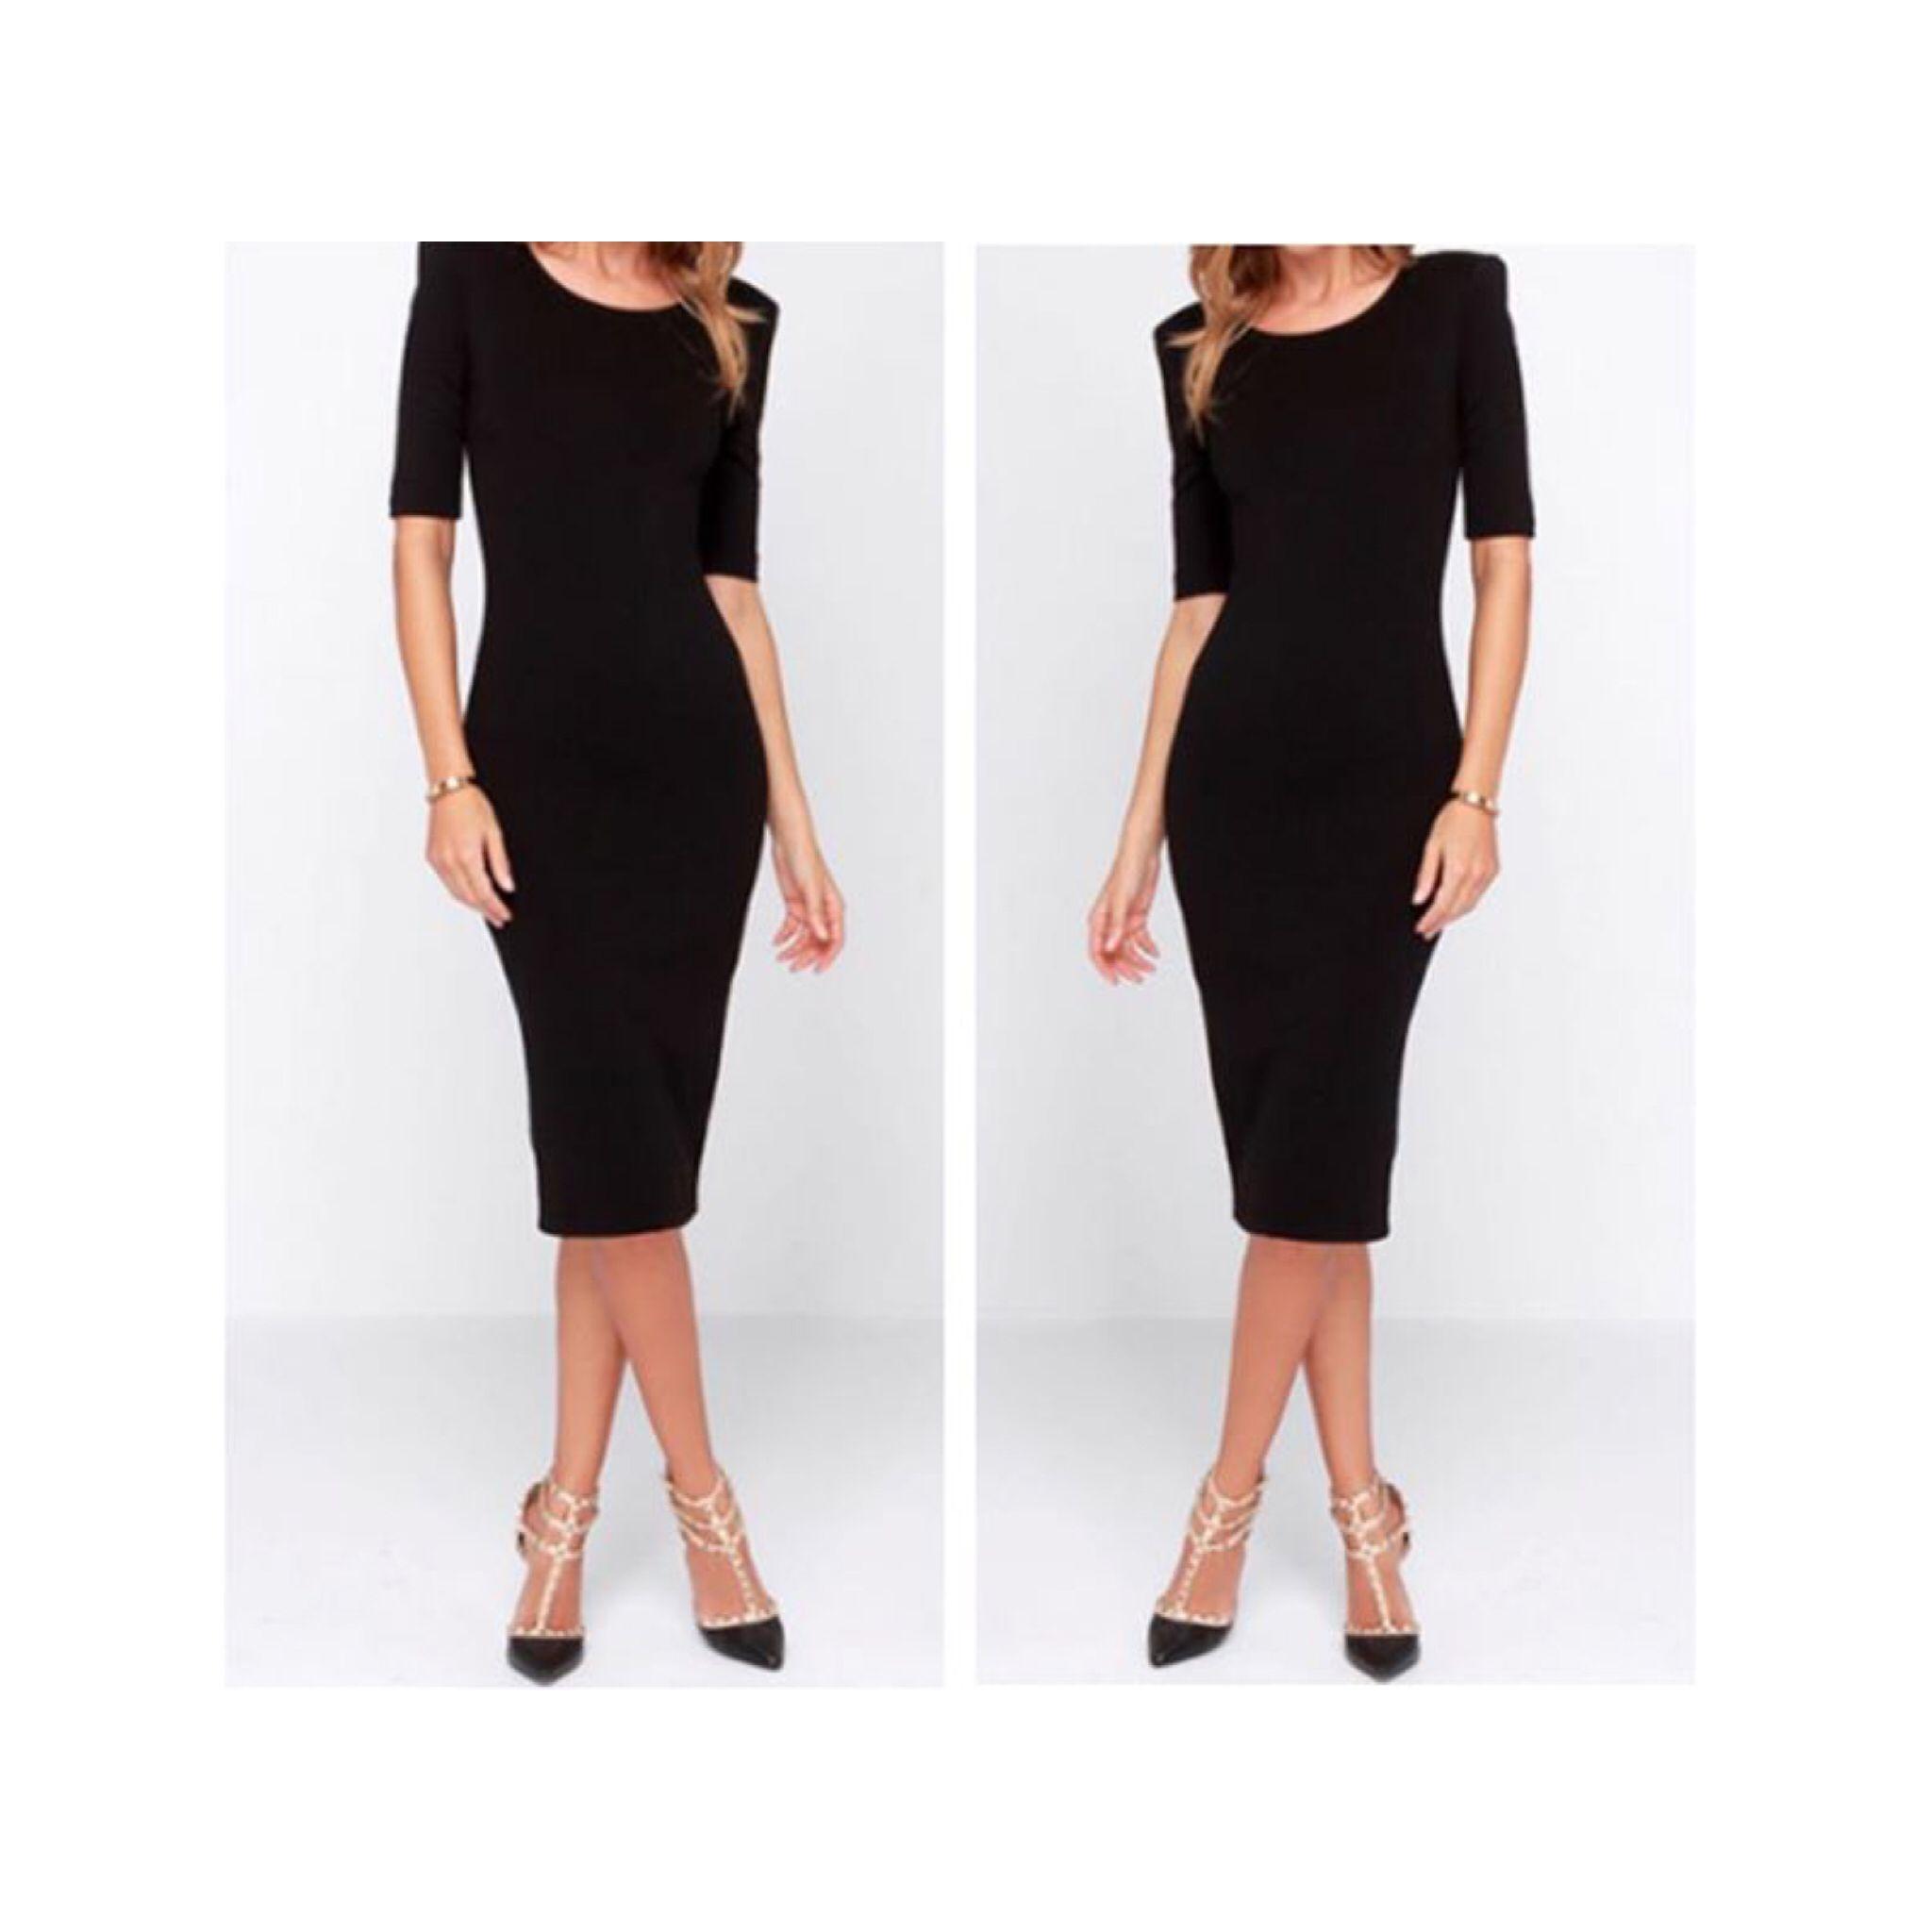 197524c8a2cde Rule of a Lady ... Three Words: Little.Black.Dress